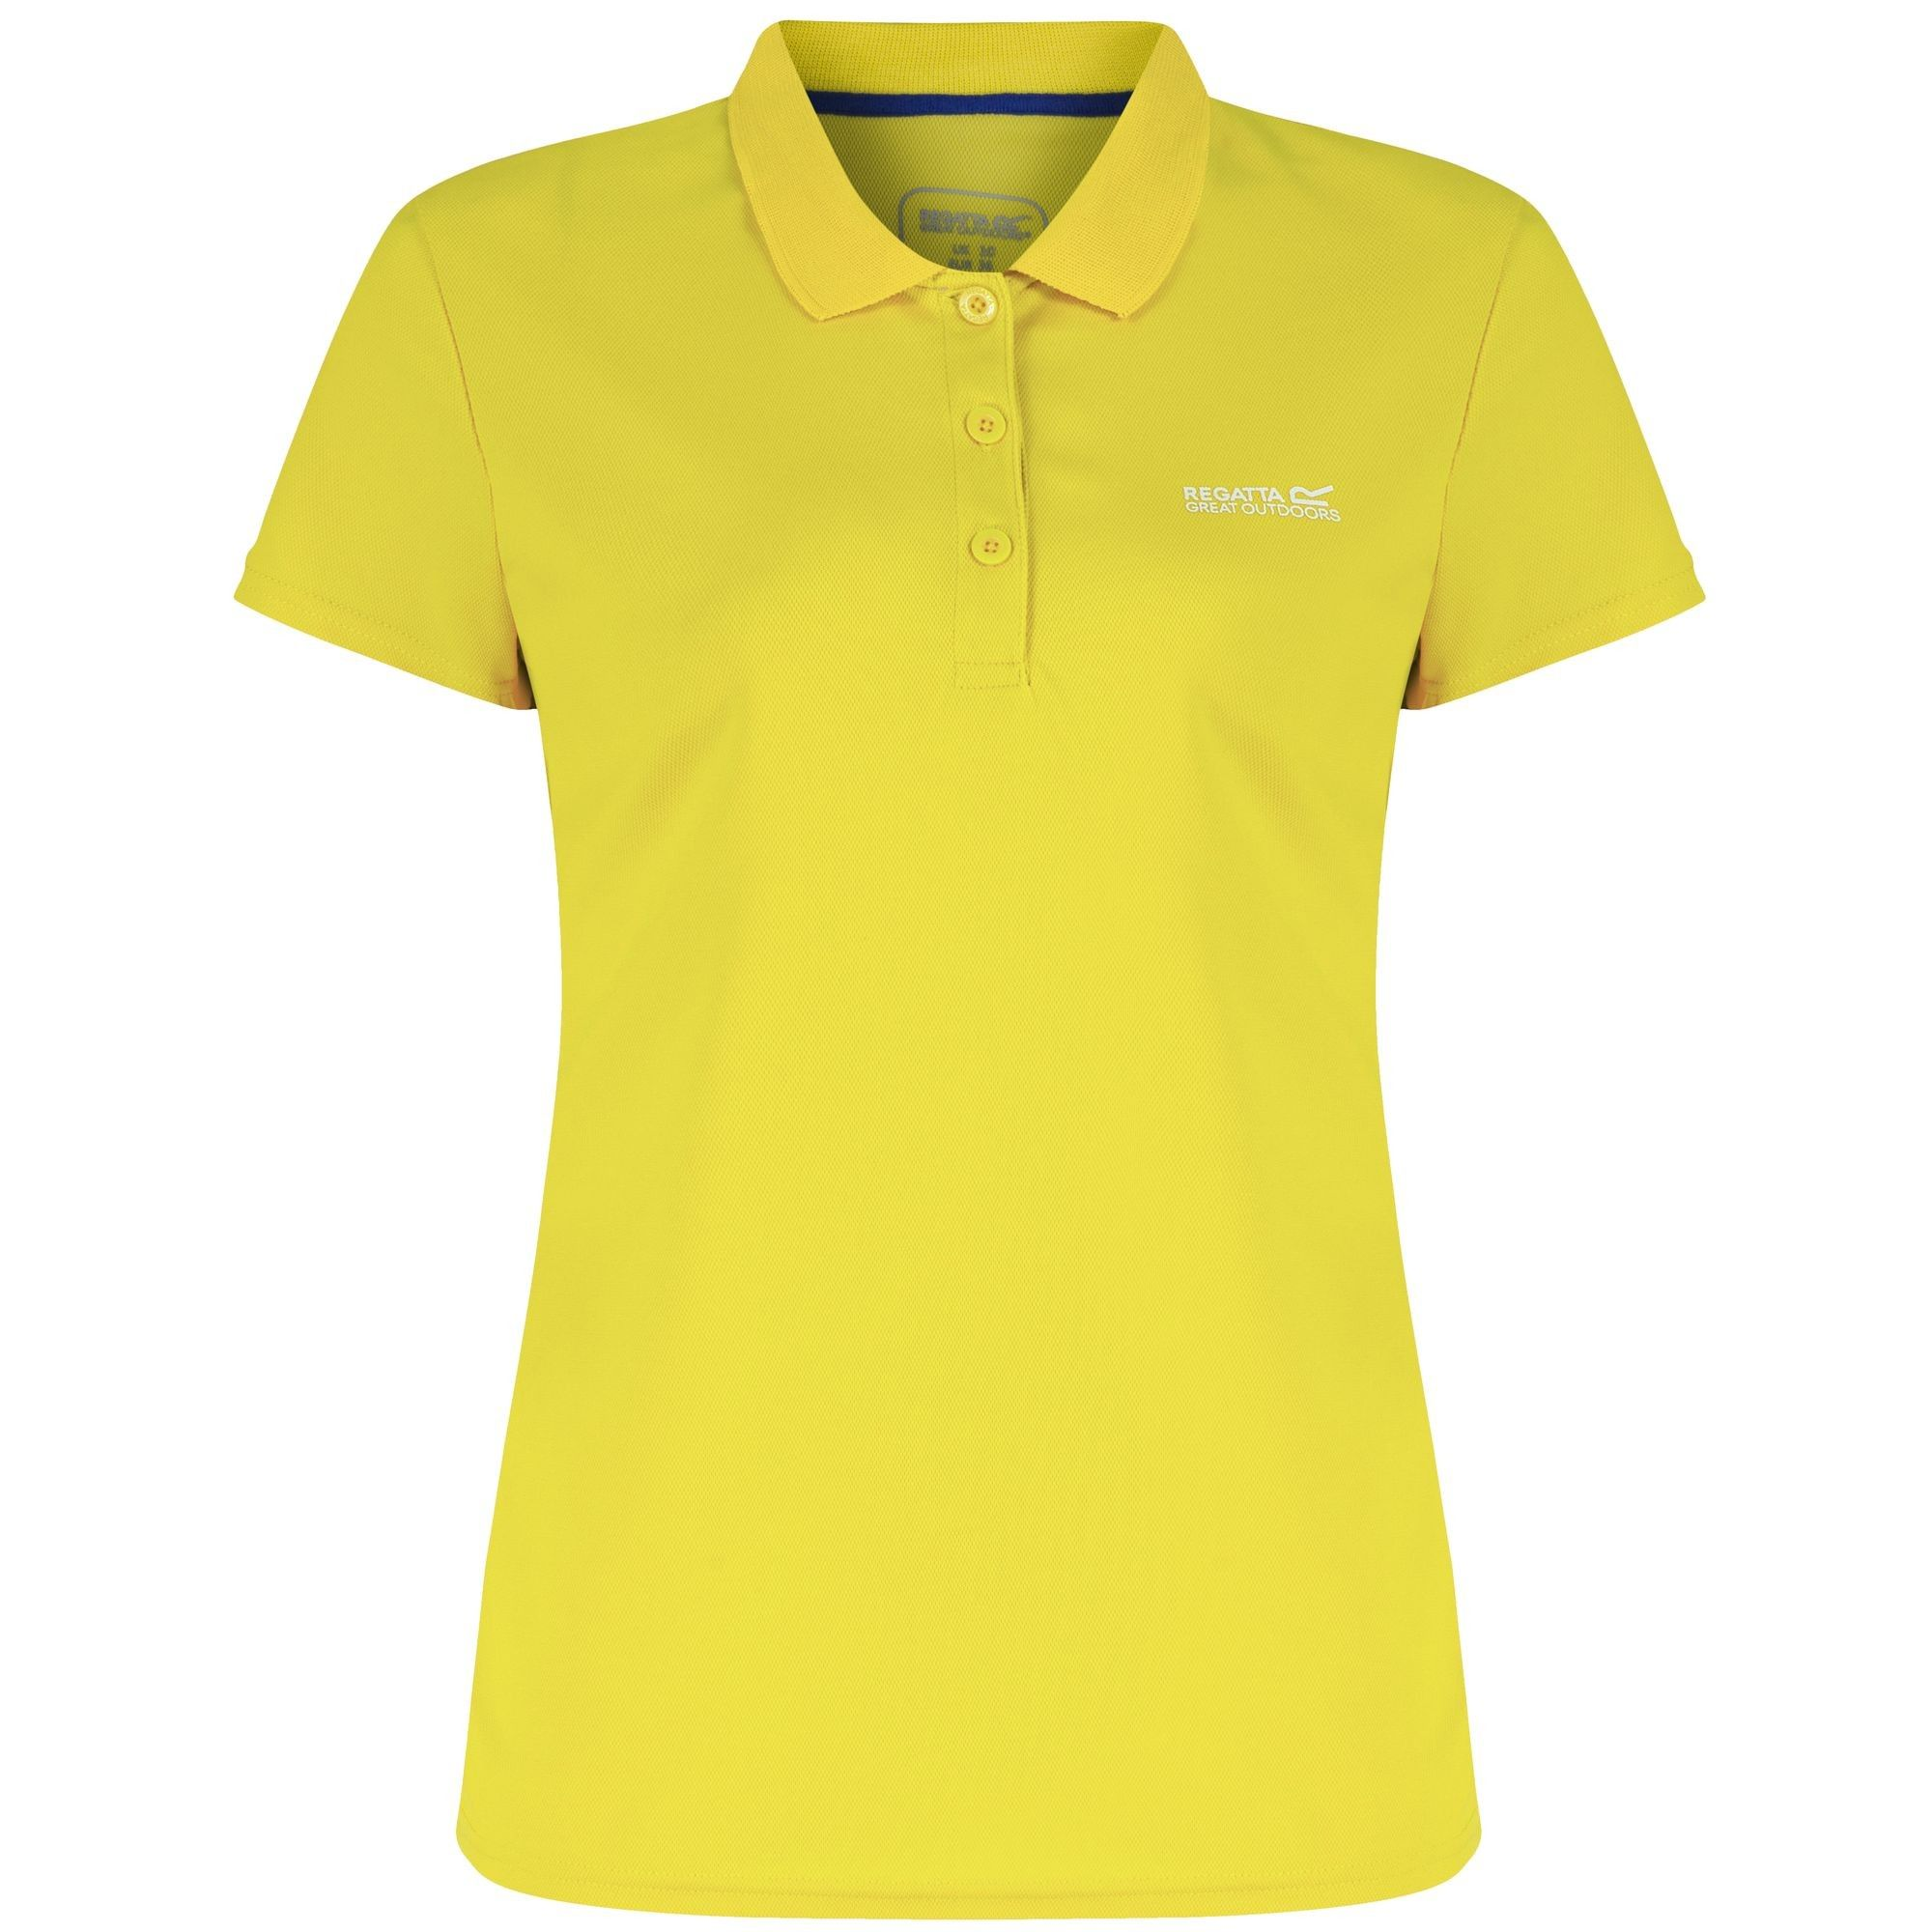 Regatta Great Outdoors Womens/Ladies Maverik III Short Sleeve Polo Shirt